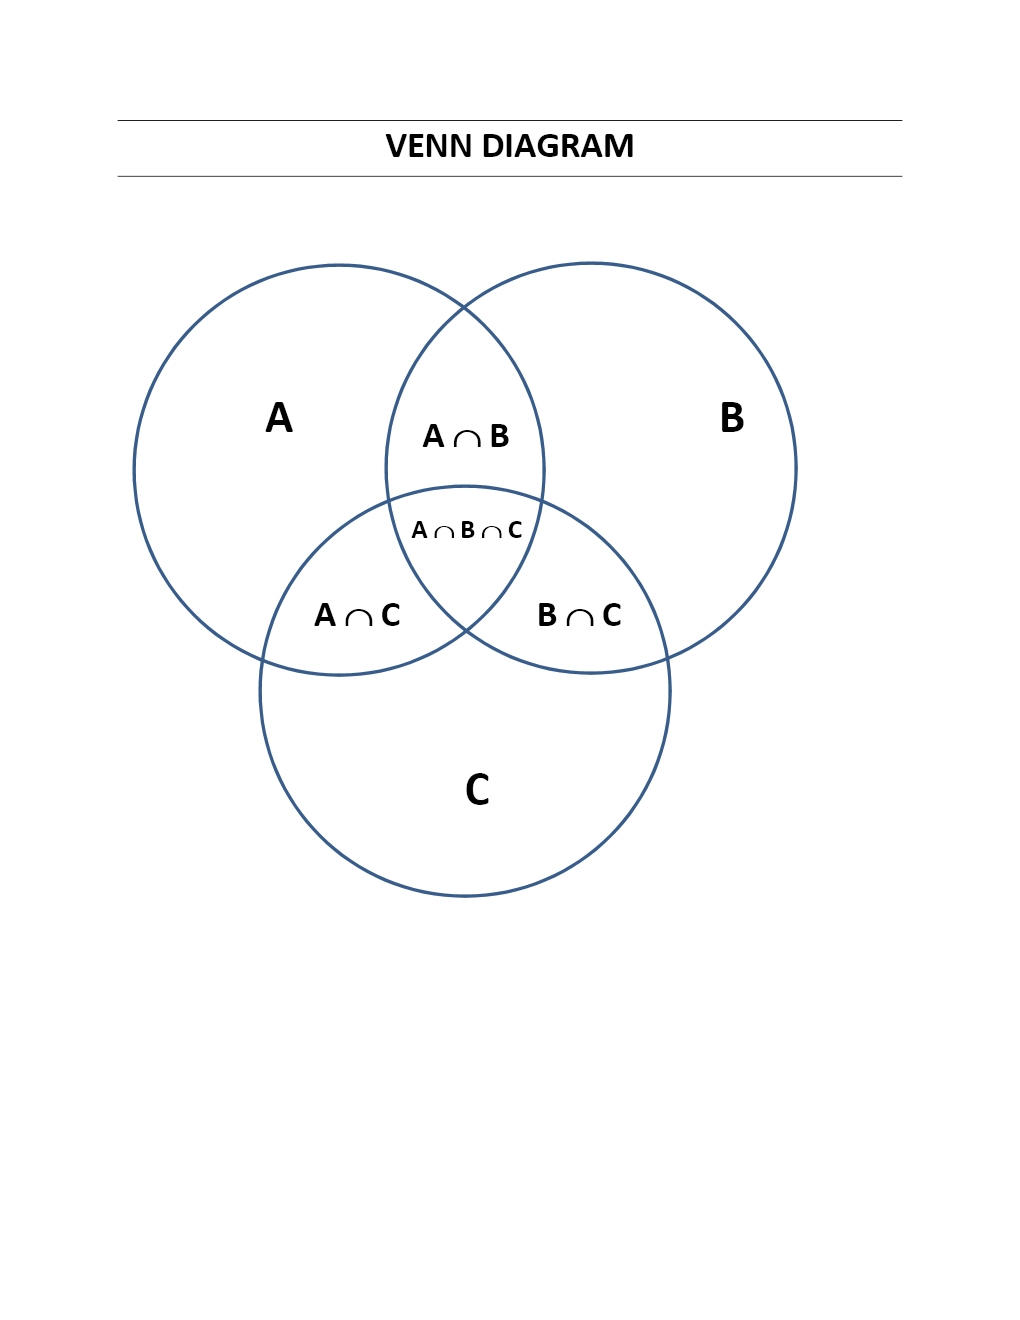 Venn Diagram Template Venn Diagram